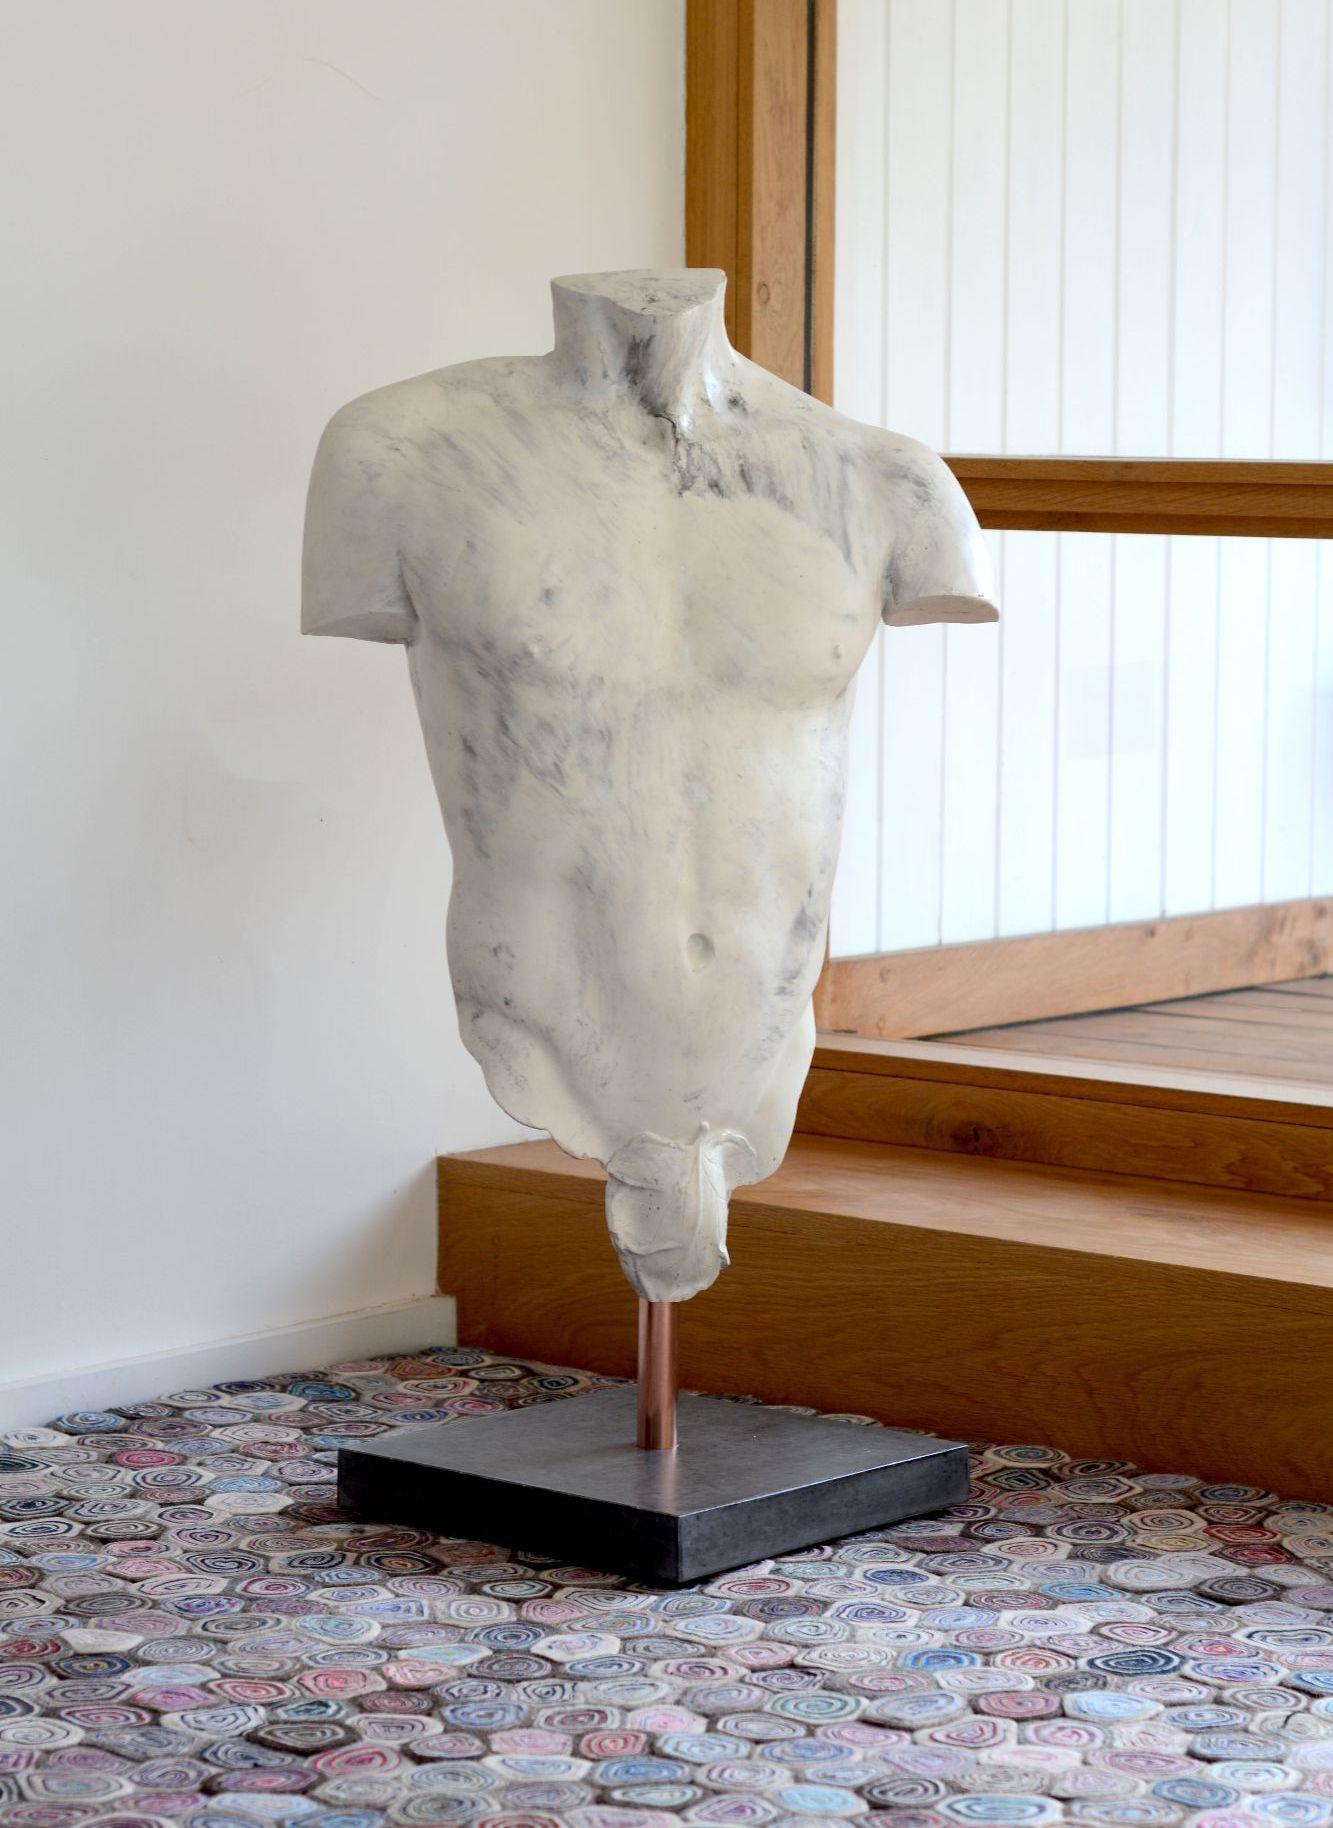 Polished white marble effect concrete male torso